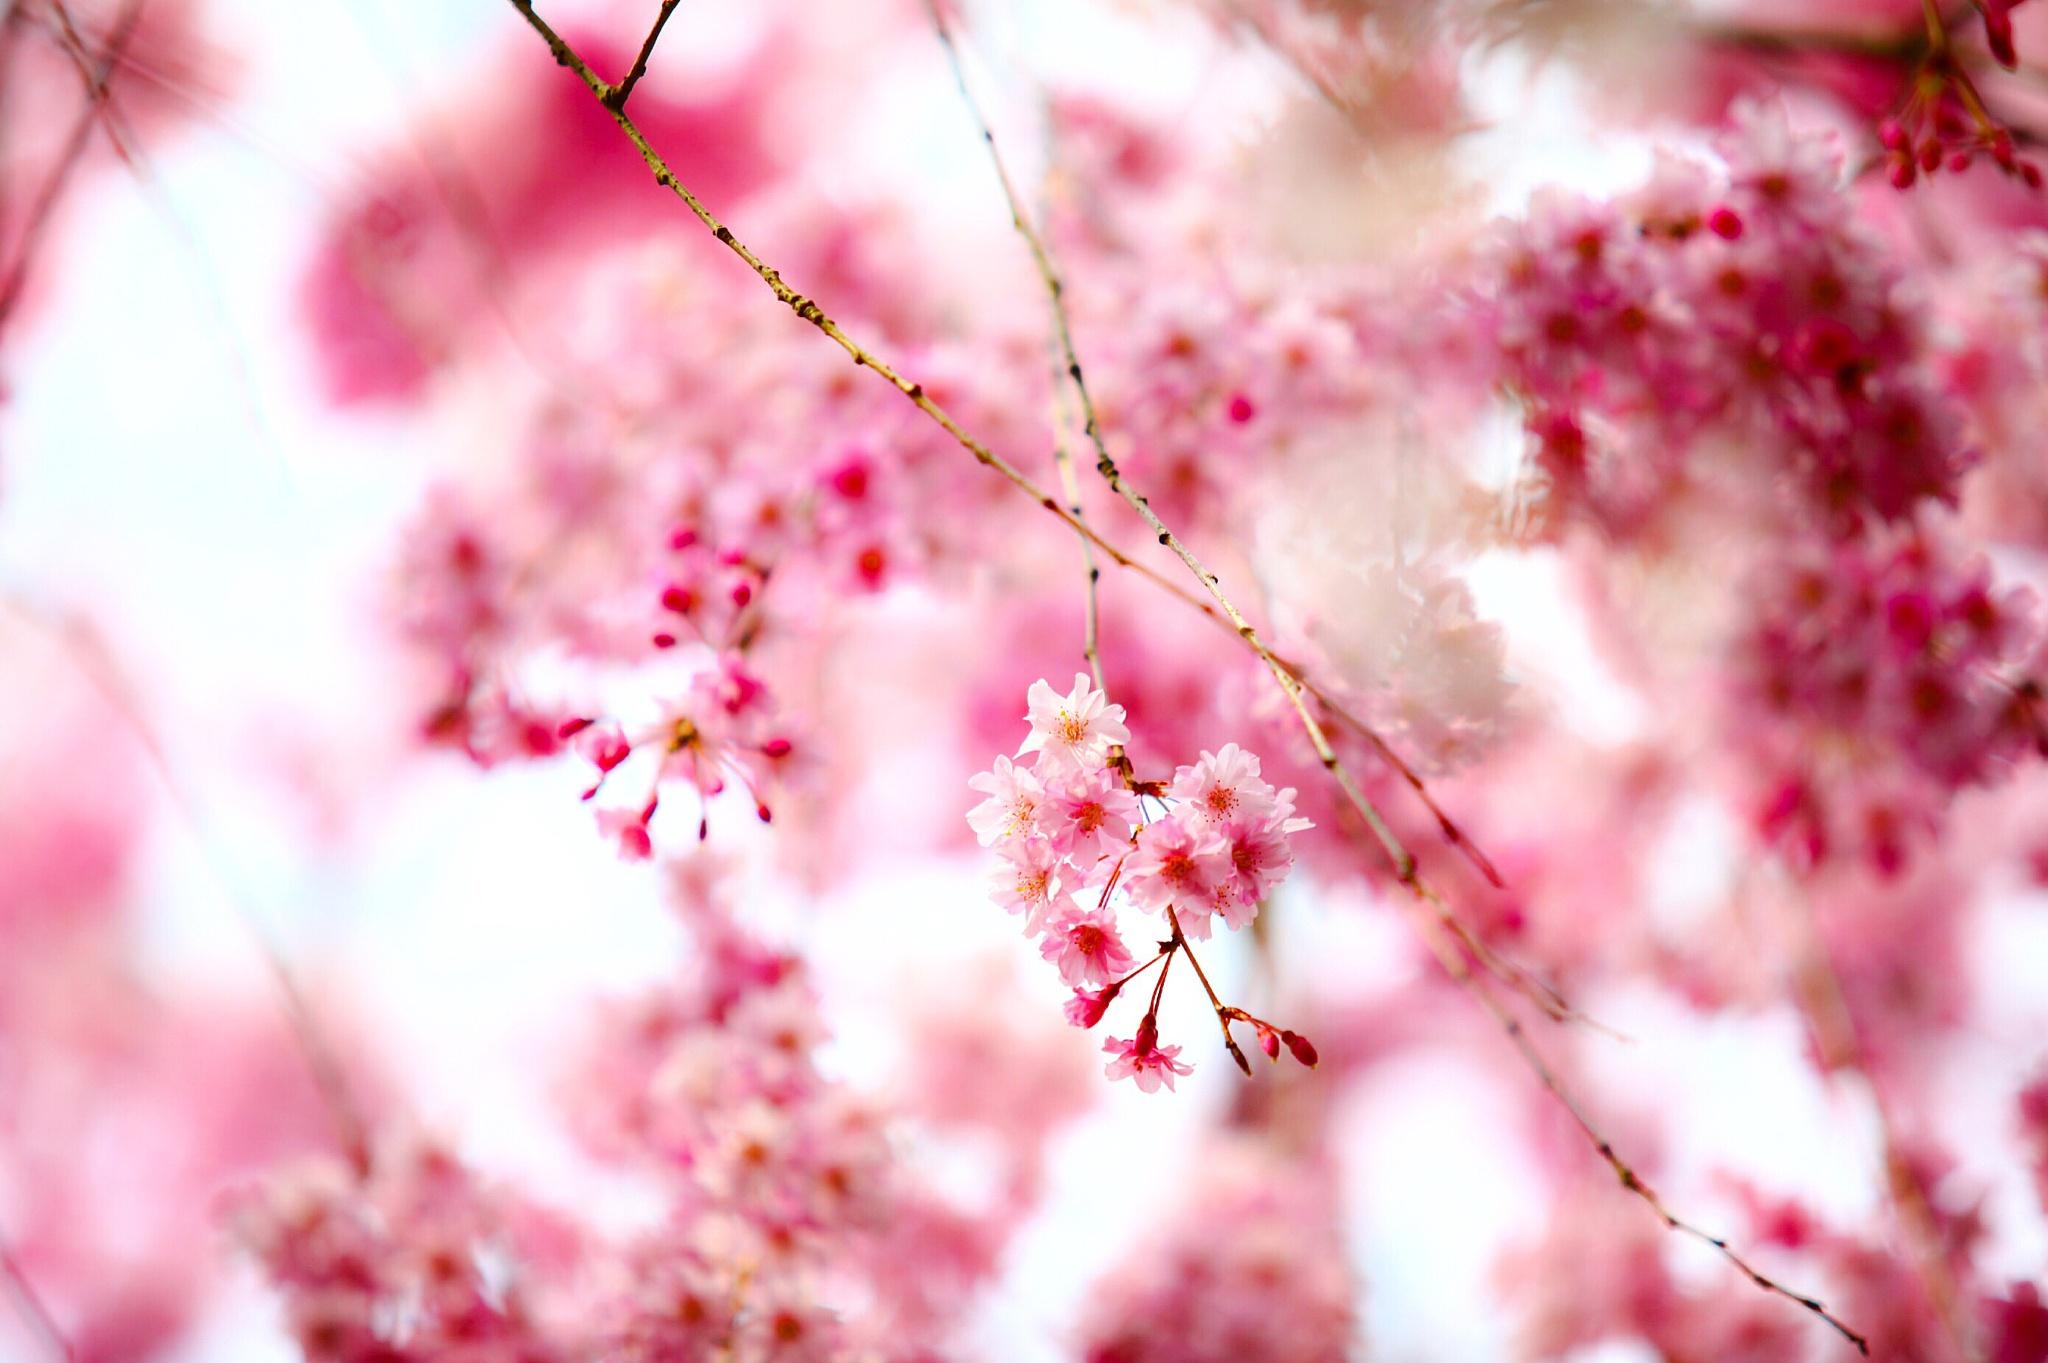 Cherry blossom in Kyoto by yuri suzuki